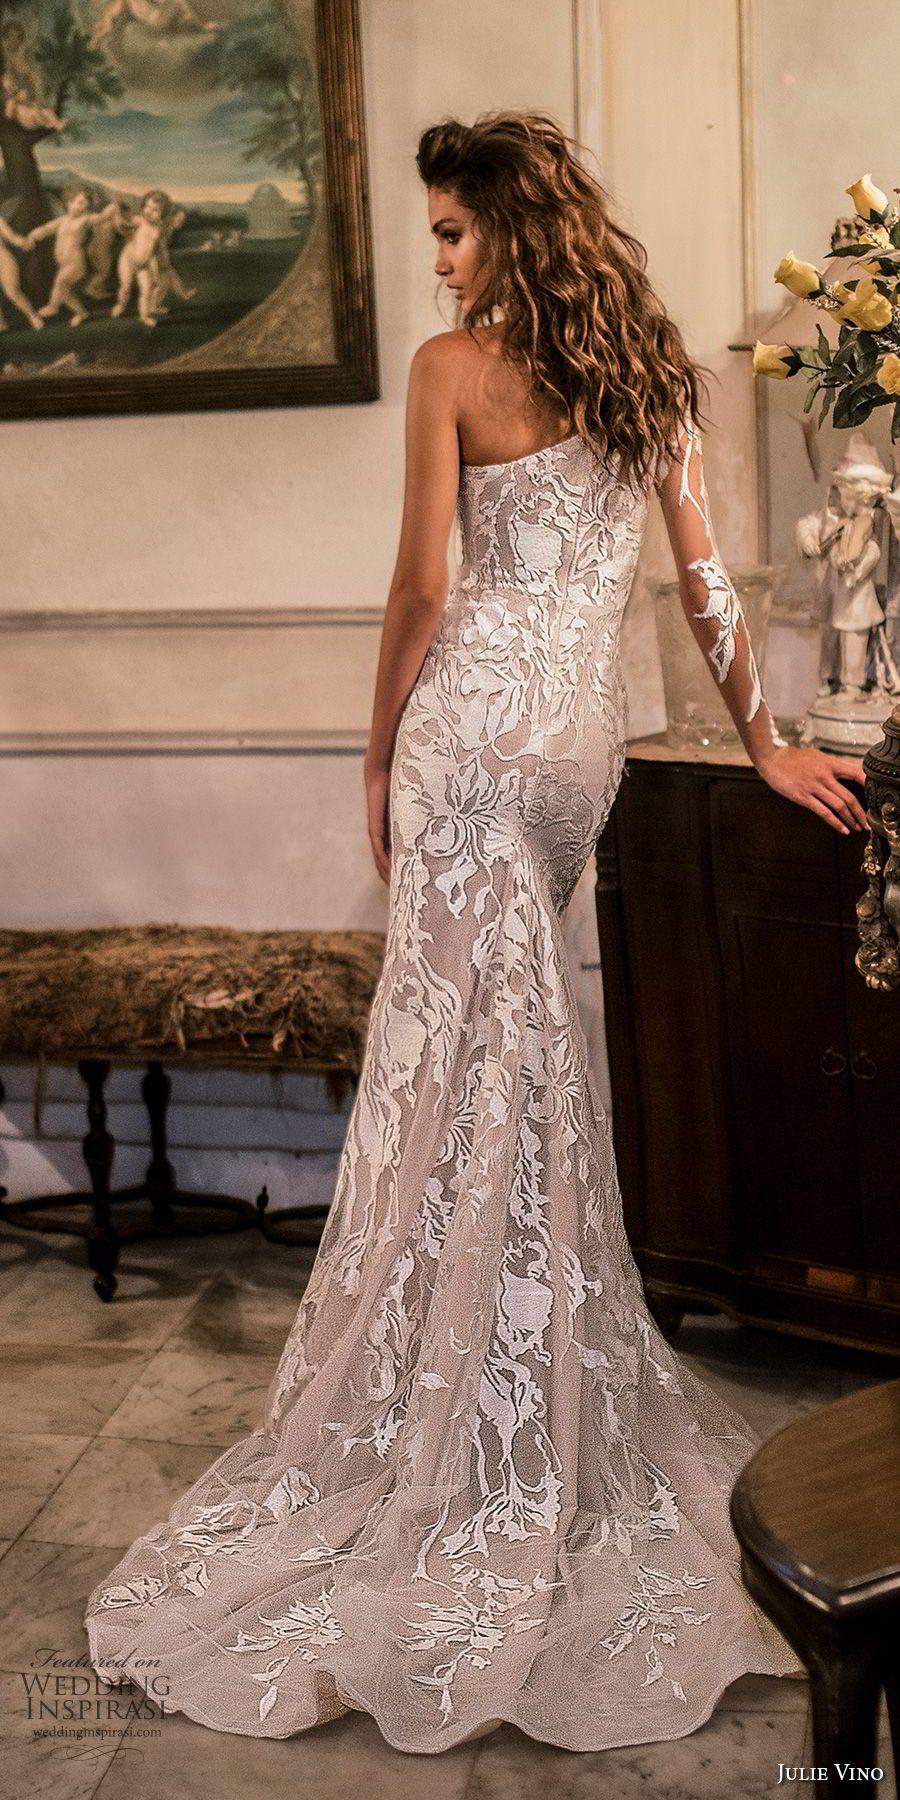 Julie vino fall wedding dresses u uchavanaud bridal collection